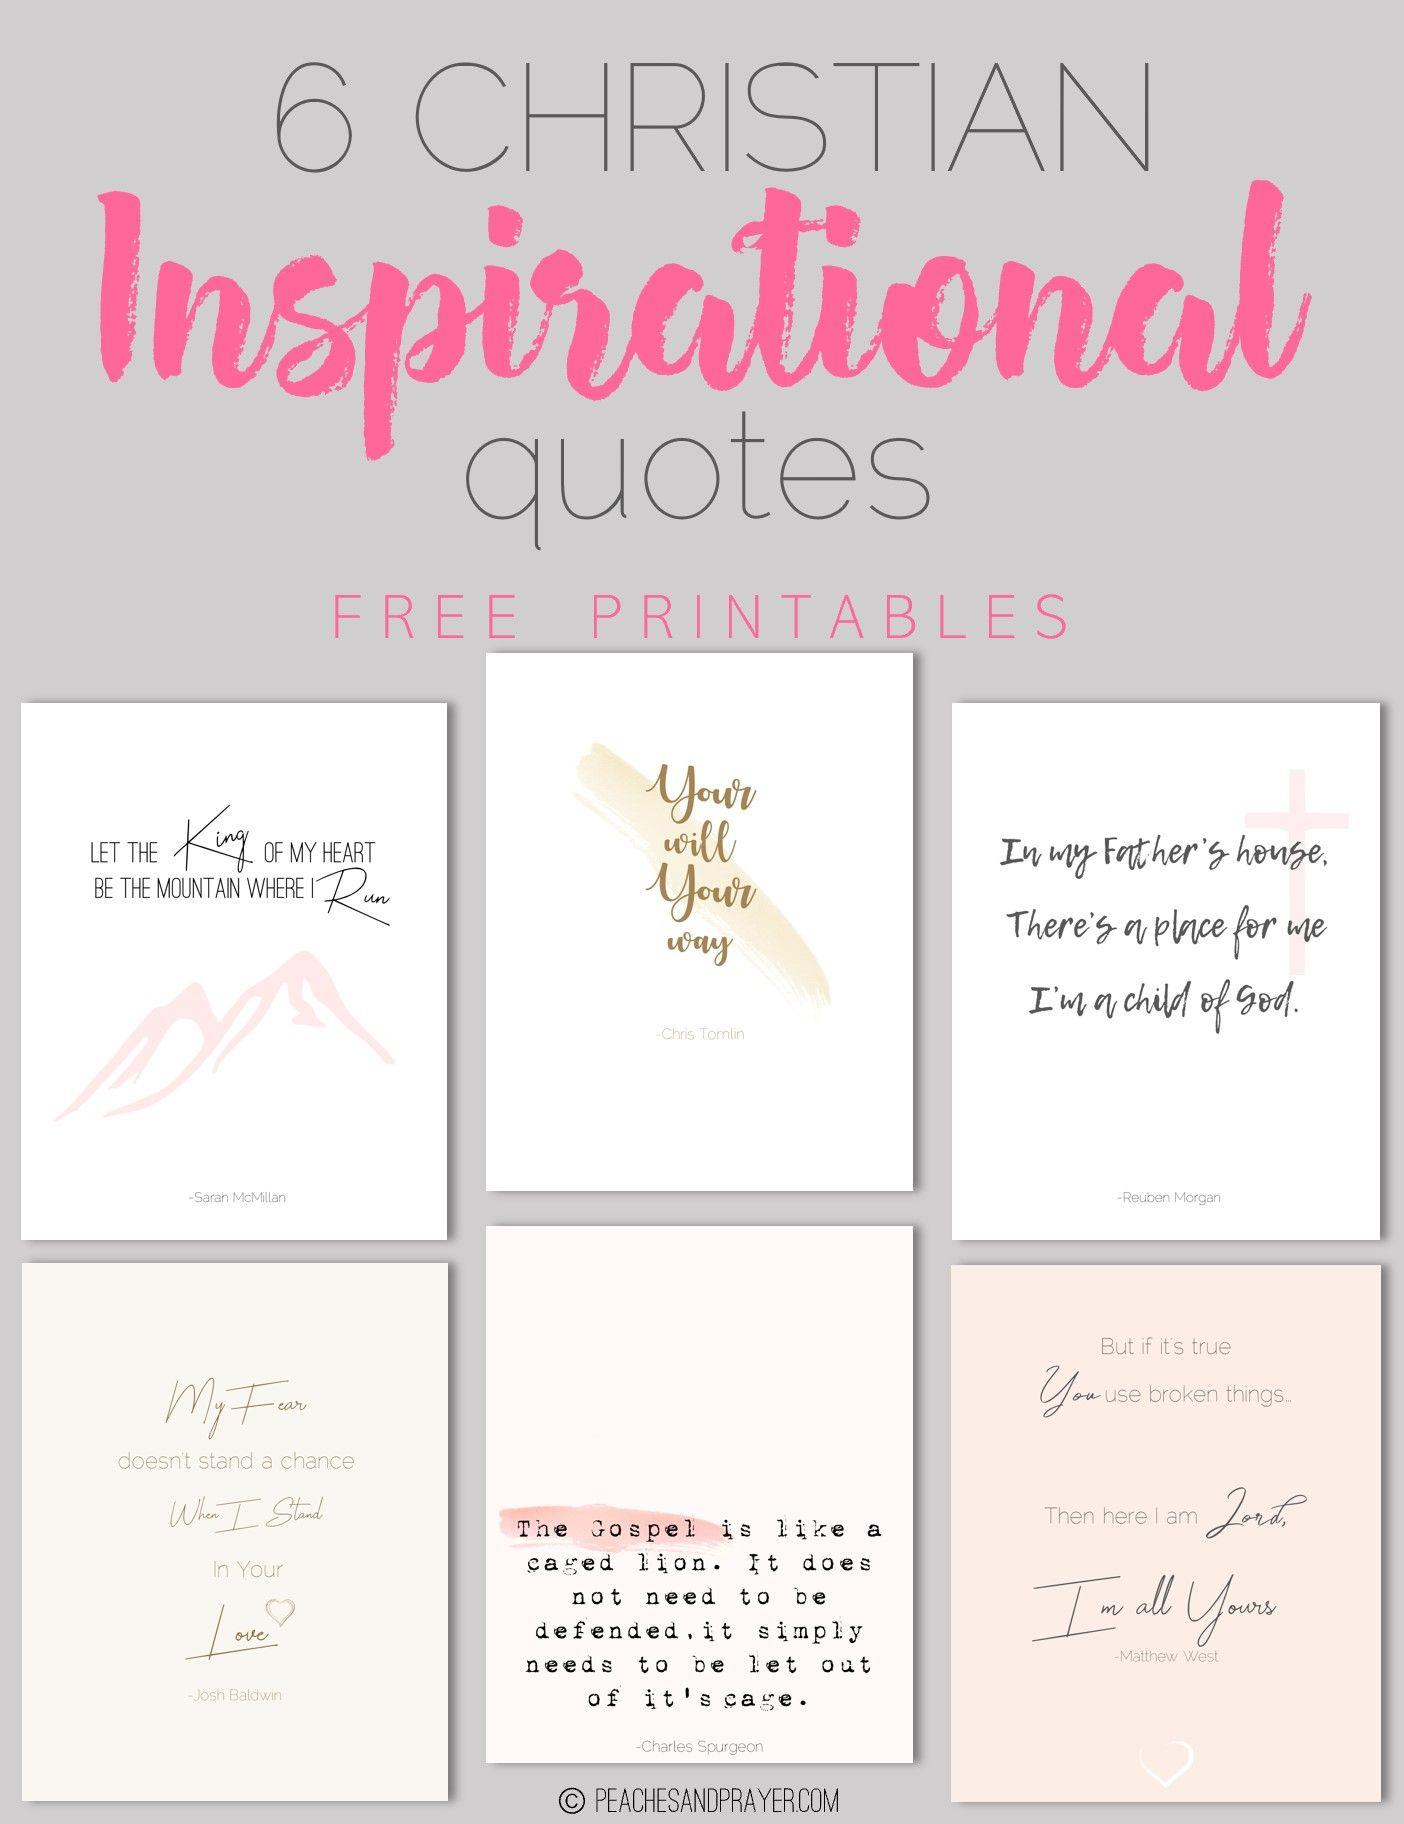 Christian Inspirational Quotes Free Printable Wall Art Quotes Christian Quotes Inspirational Printable Christian Quotes